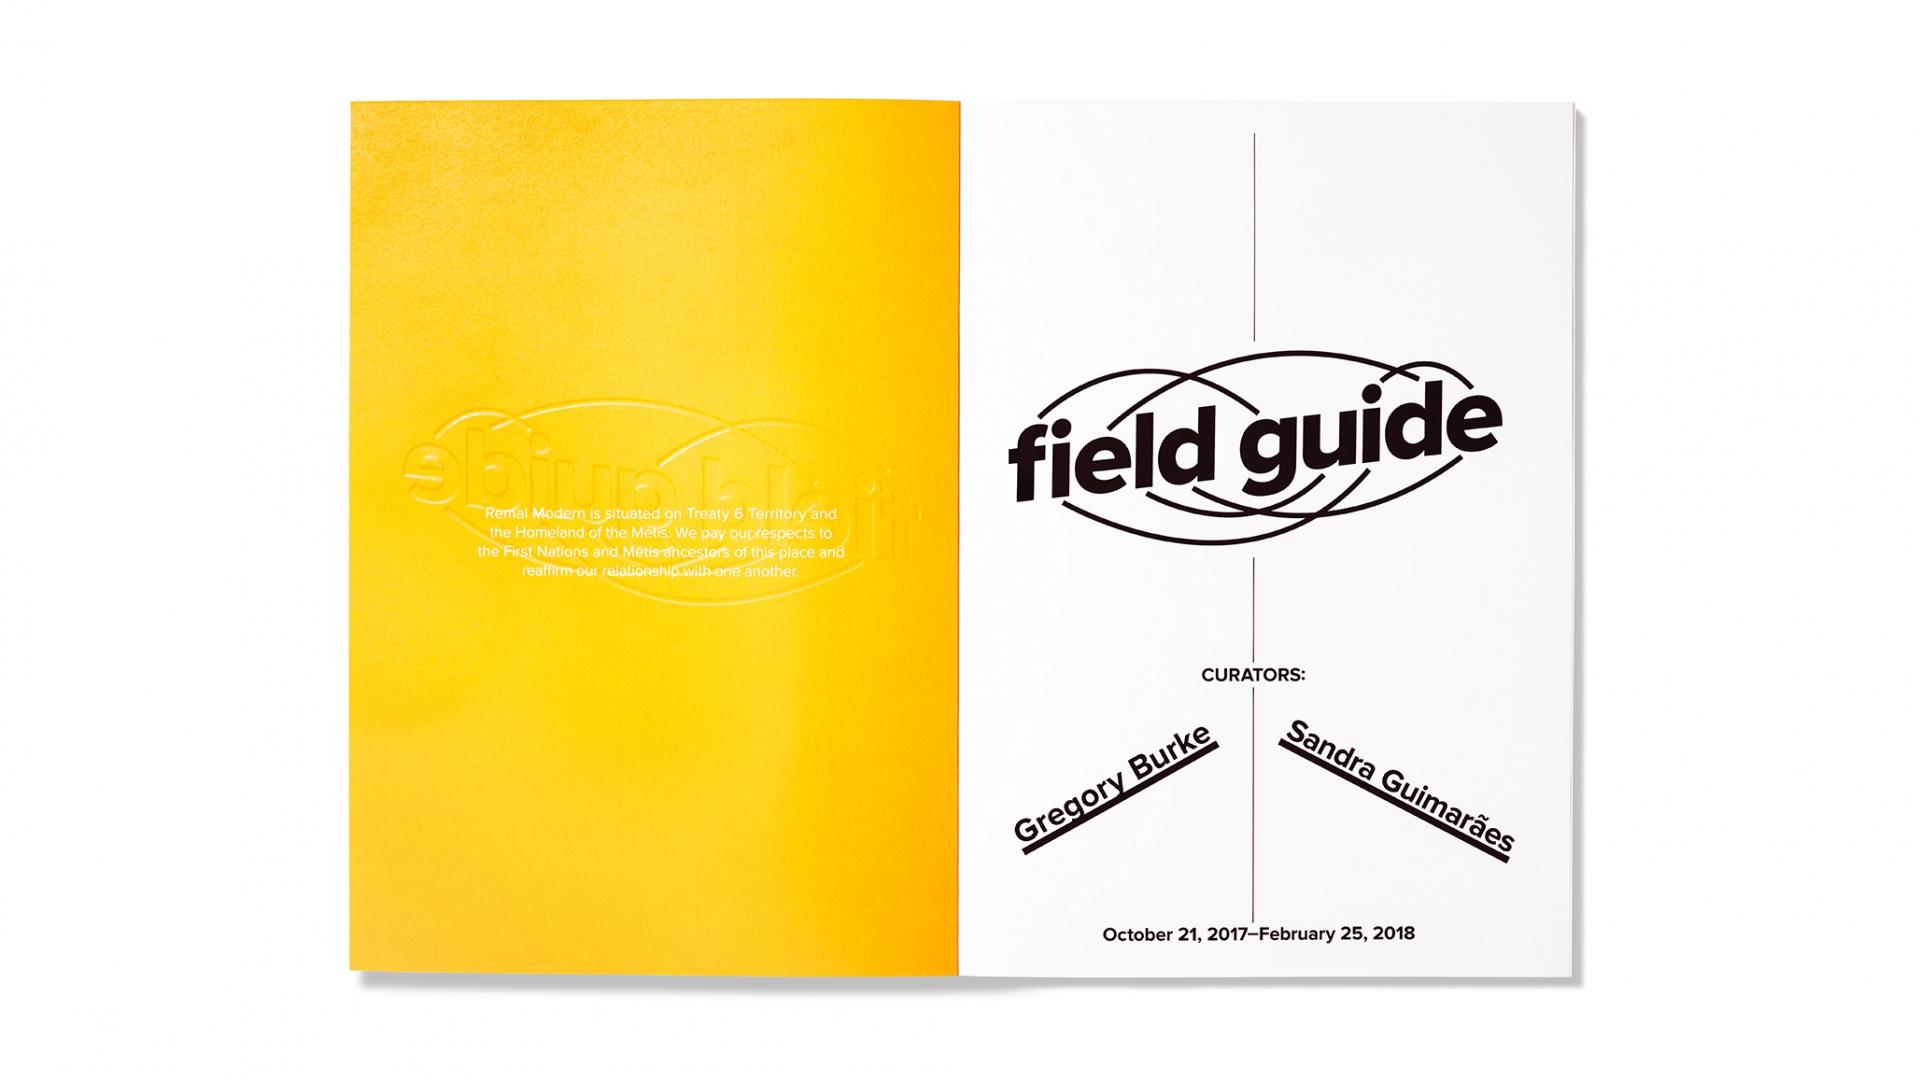 20180618-rm-book-spreads-1-1920x1080.jpg